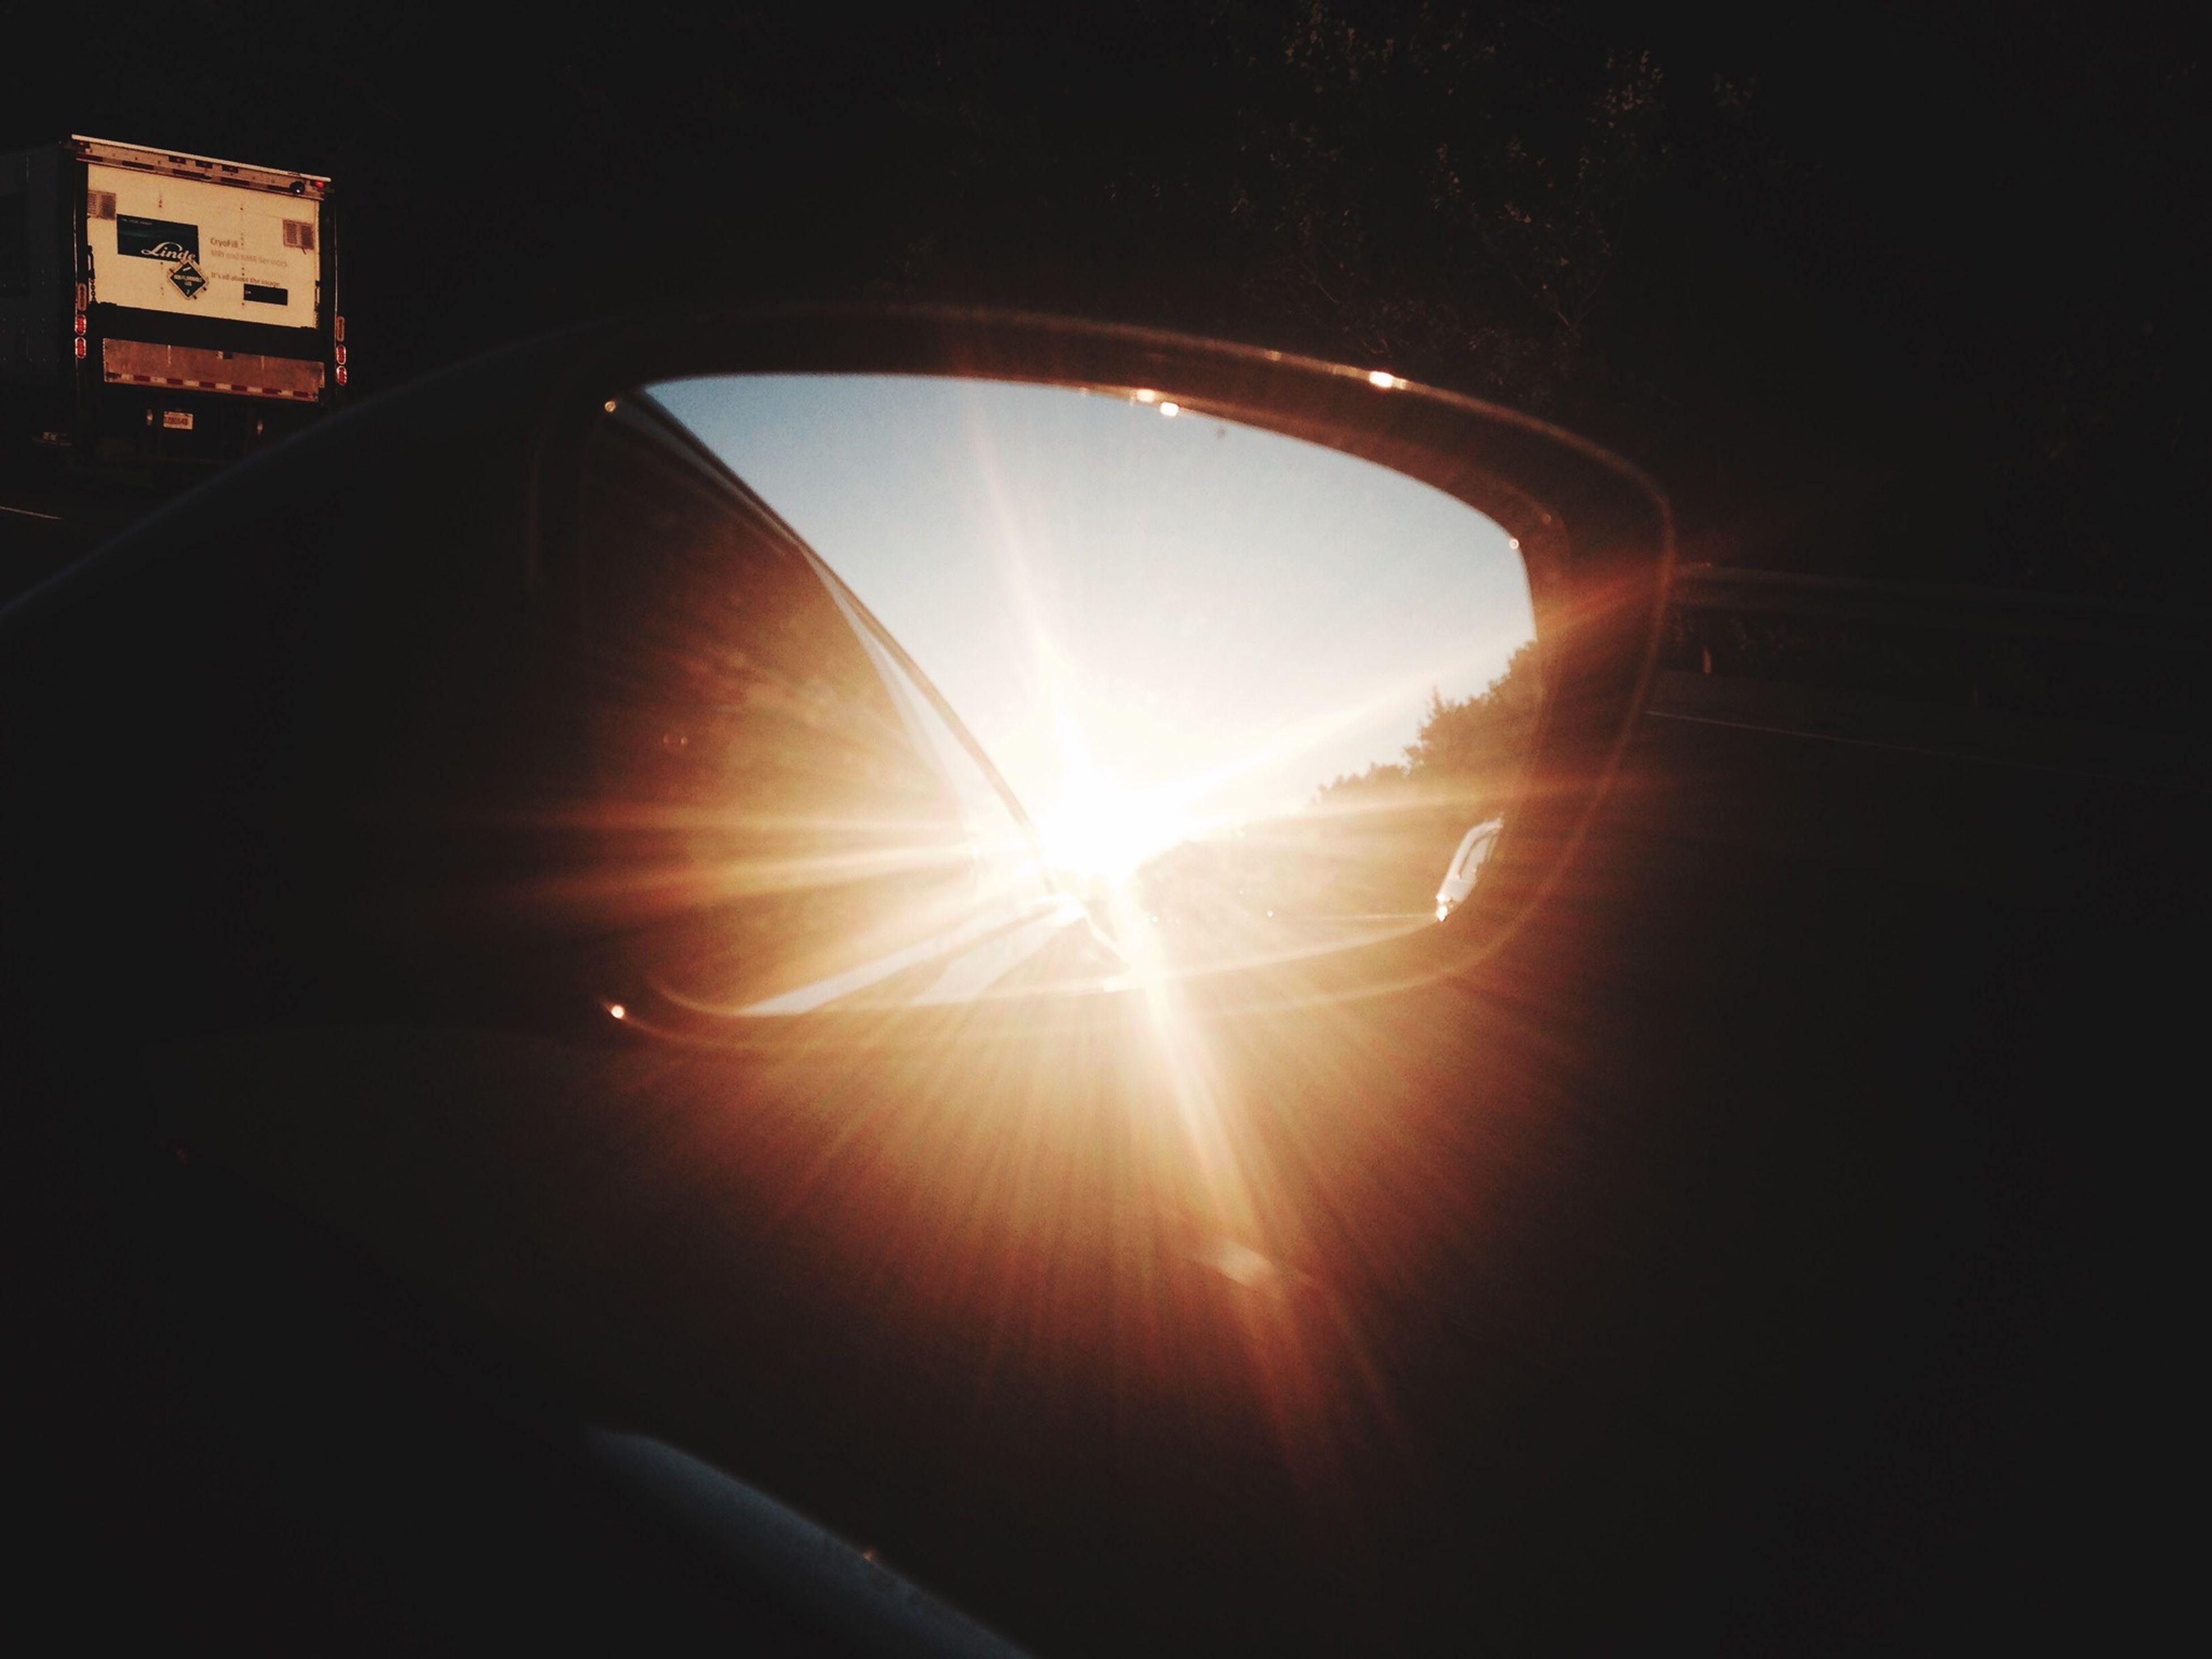 transportation, sun, sunlight, mode of transport, window, sunbeam, indoors, car, lens flare, reflection, land vehicle, glass - material, vehicle interior, silhouette, built structure, sunset, transparent, travel, architecture, dark